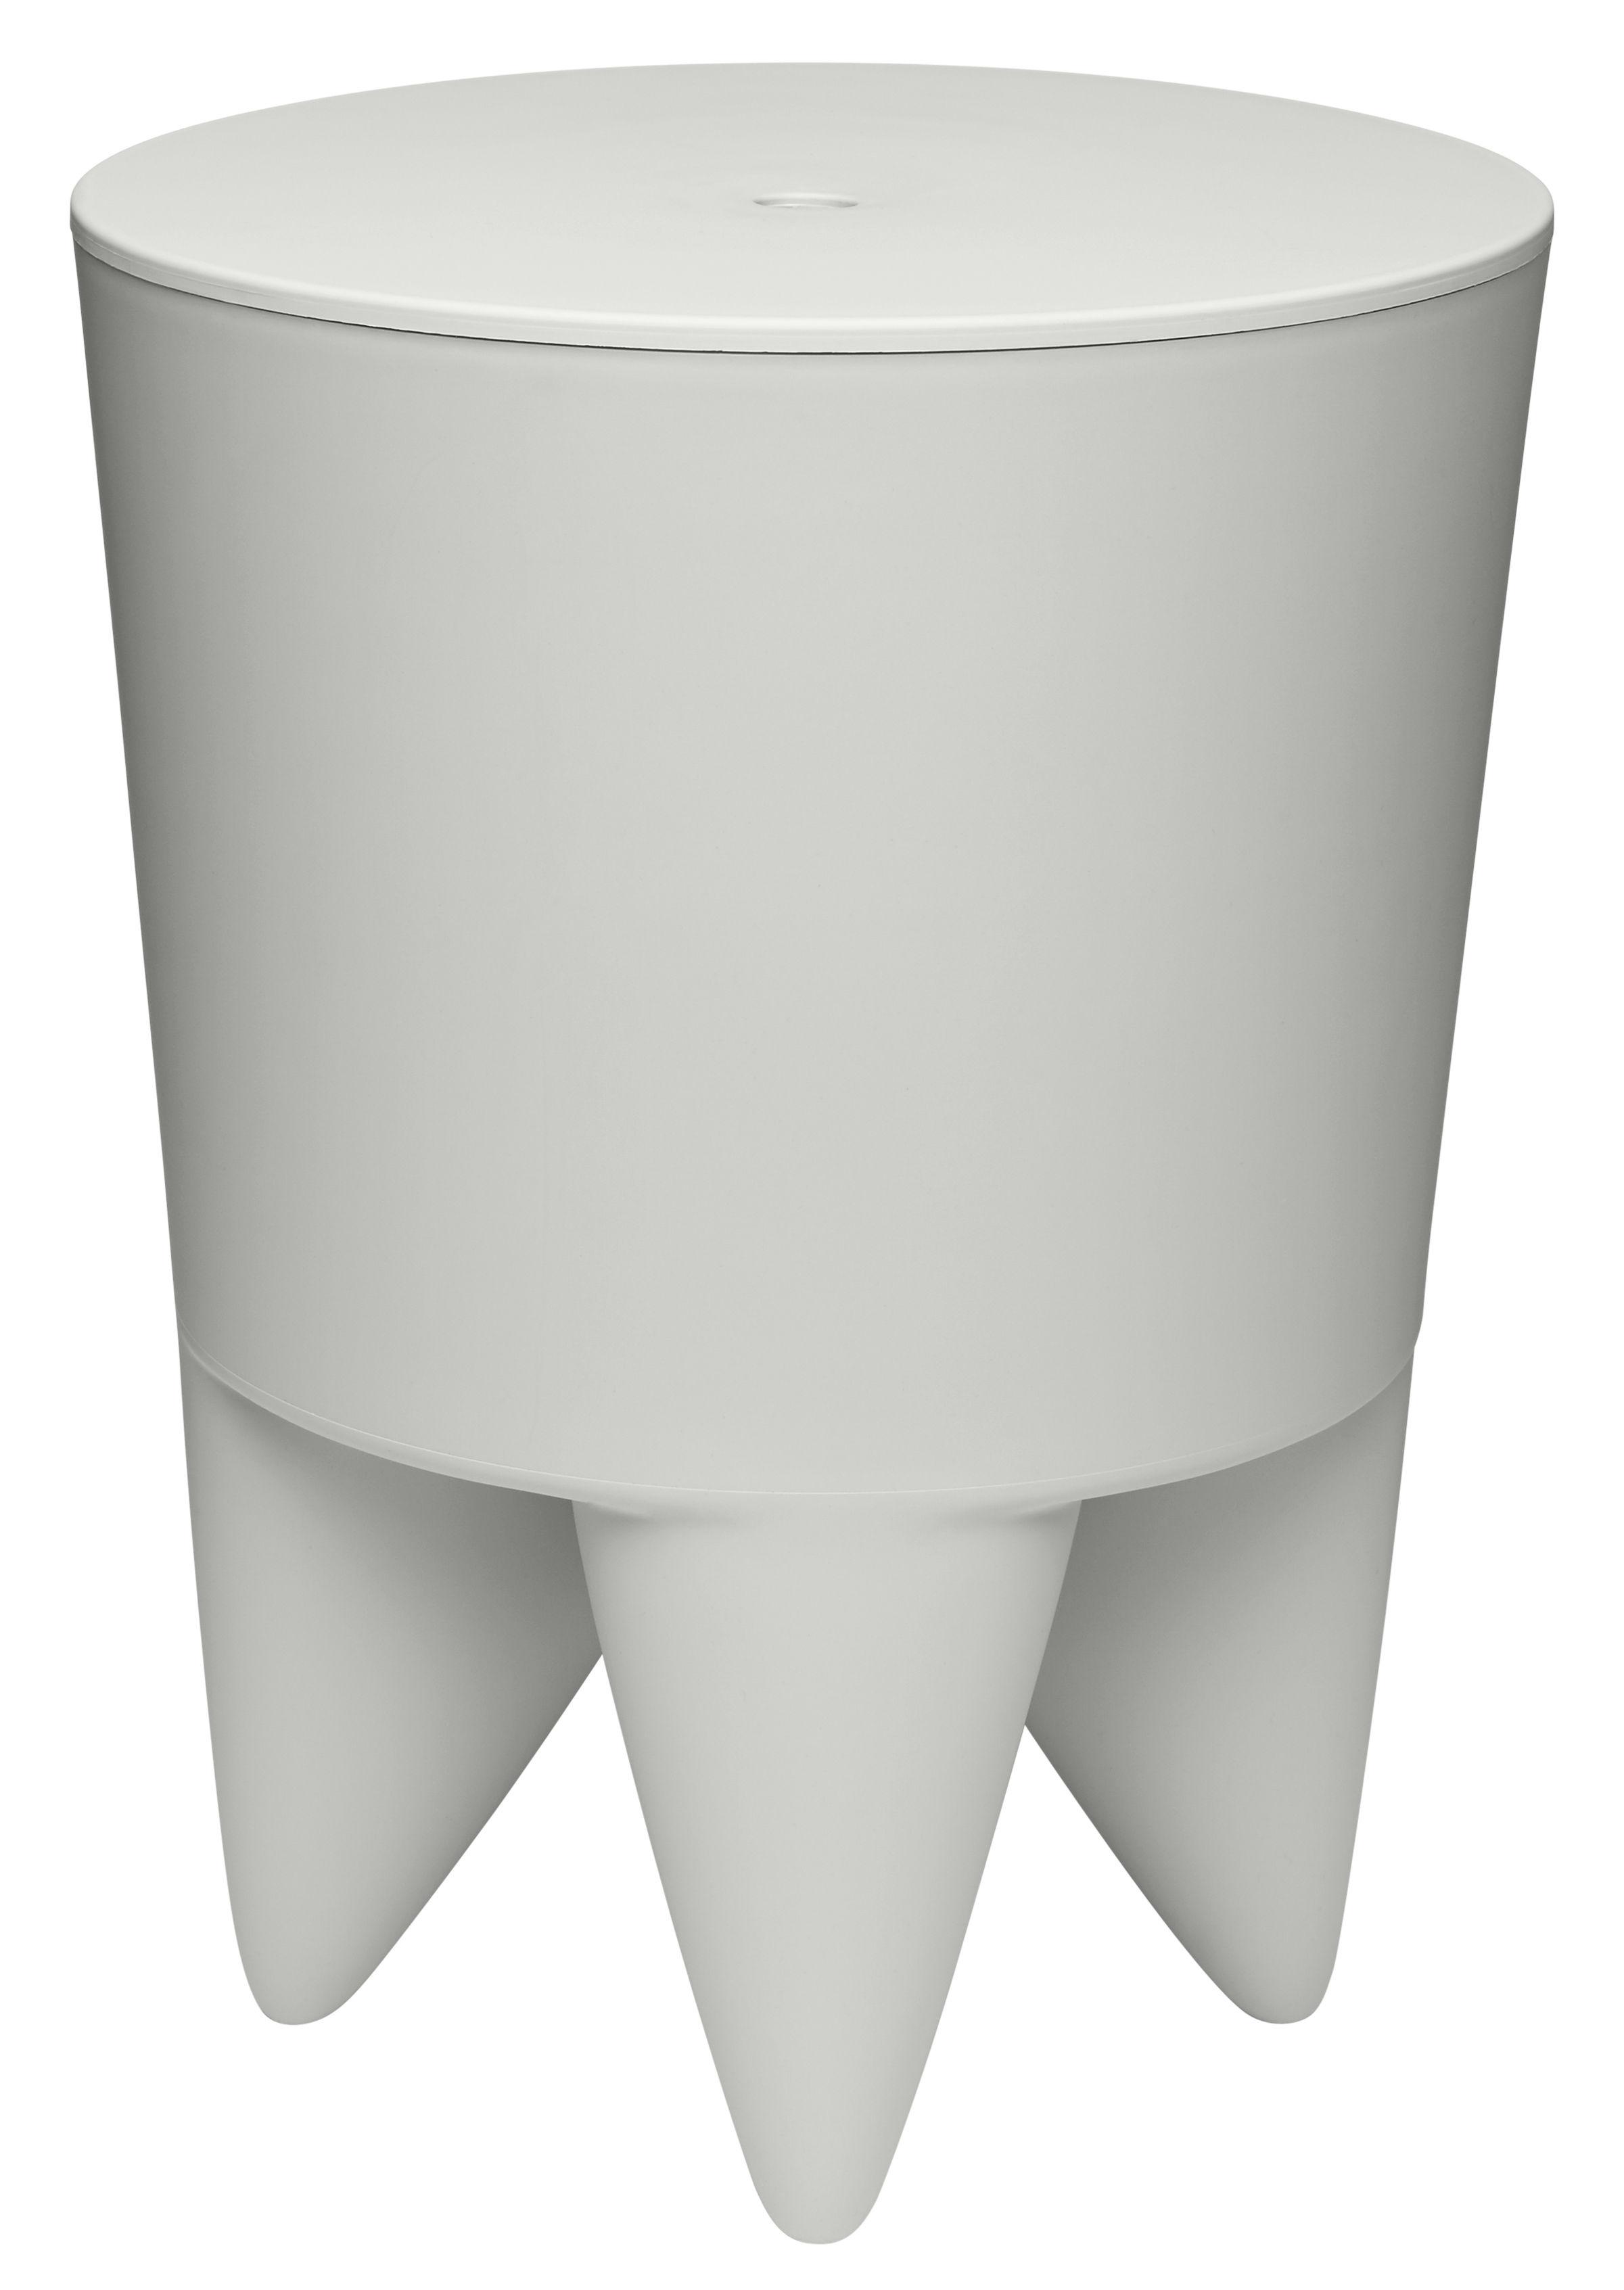 Furniture - Stools - New Bubu 1er Stool - / Box - Plastic by XO - Pale Grey - Polypropylene